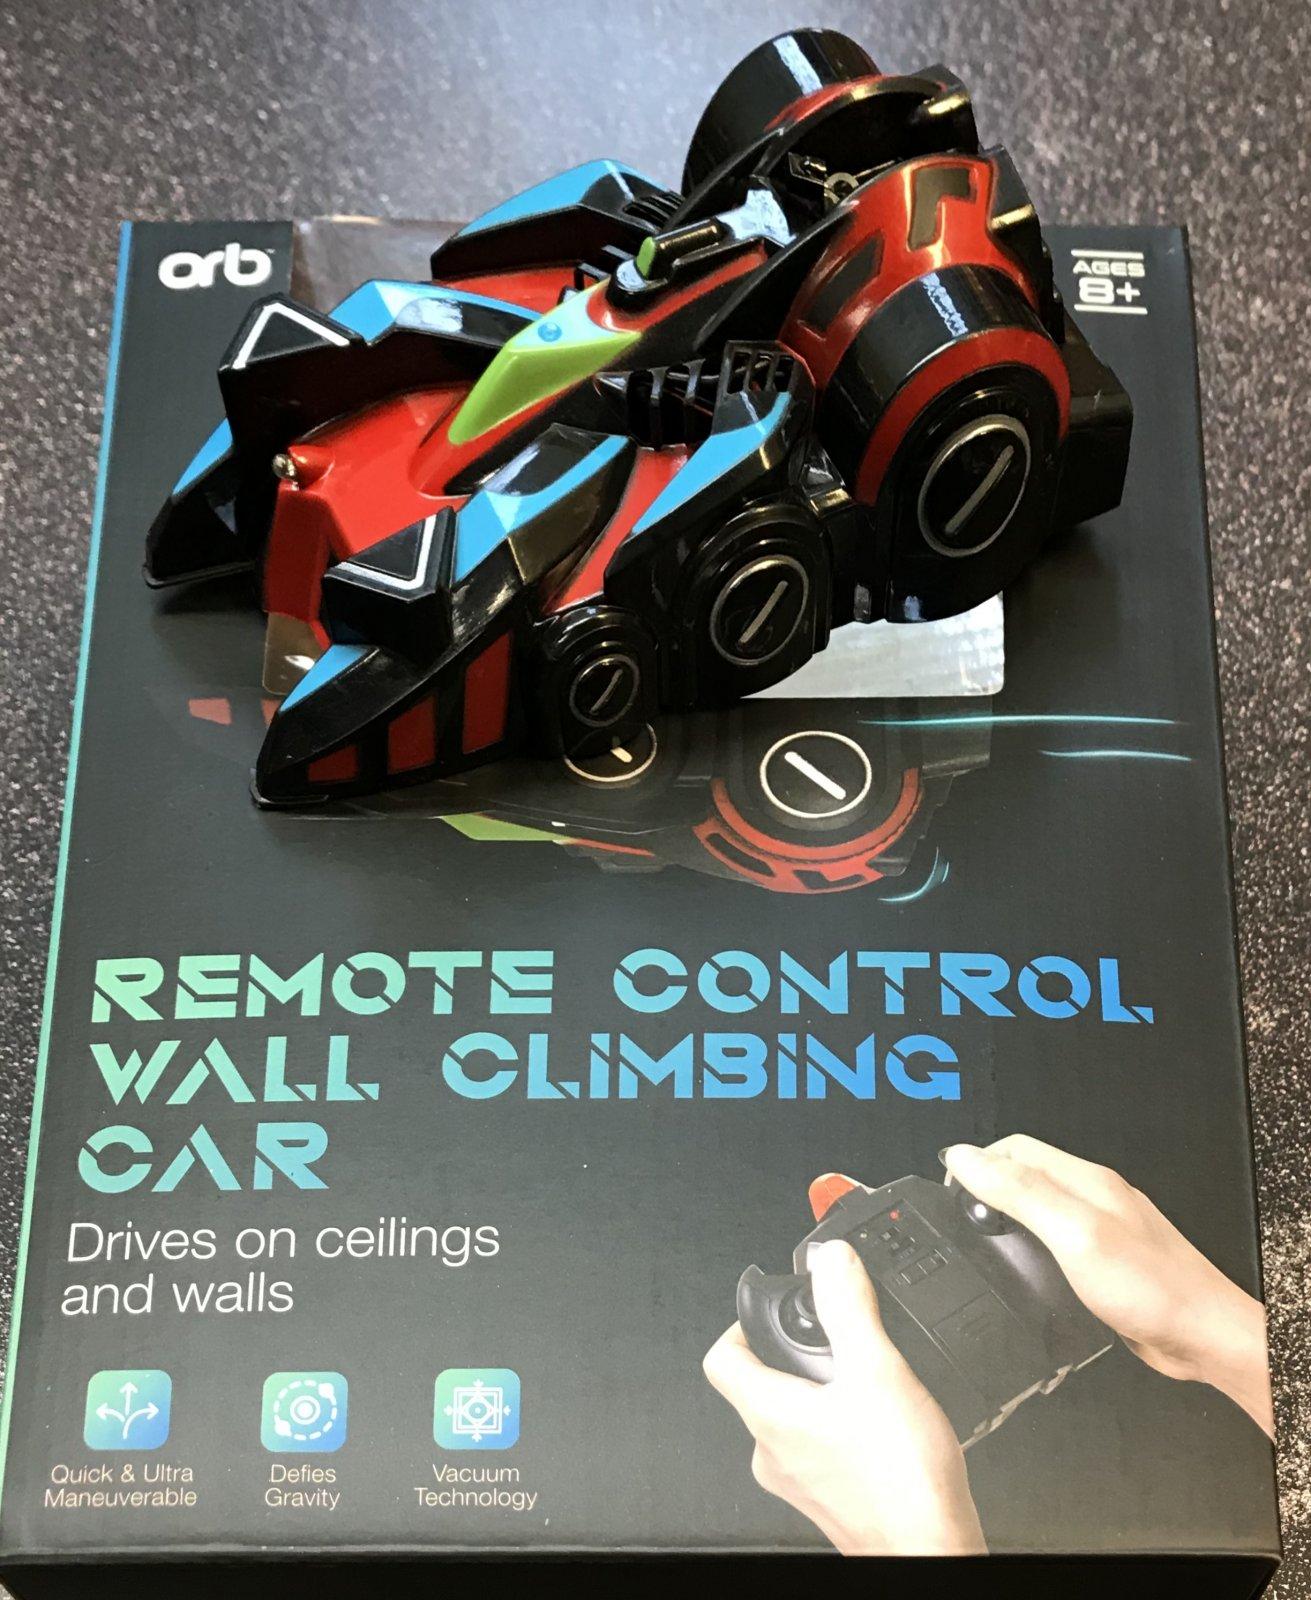 Remote Control Wall Climbing Car